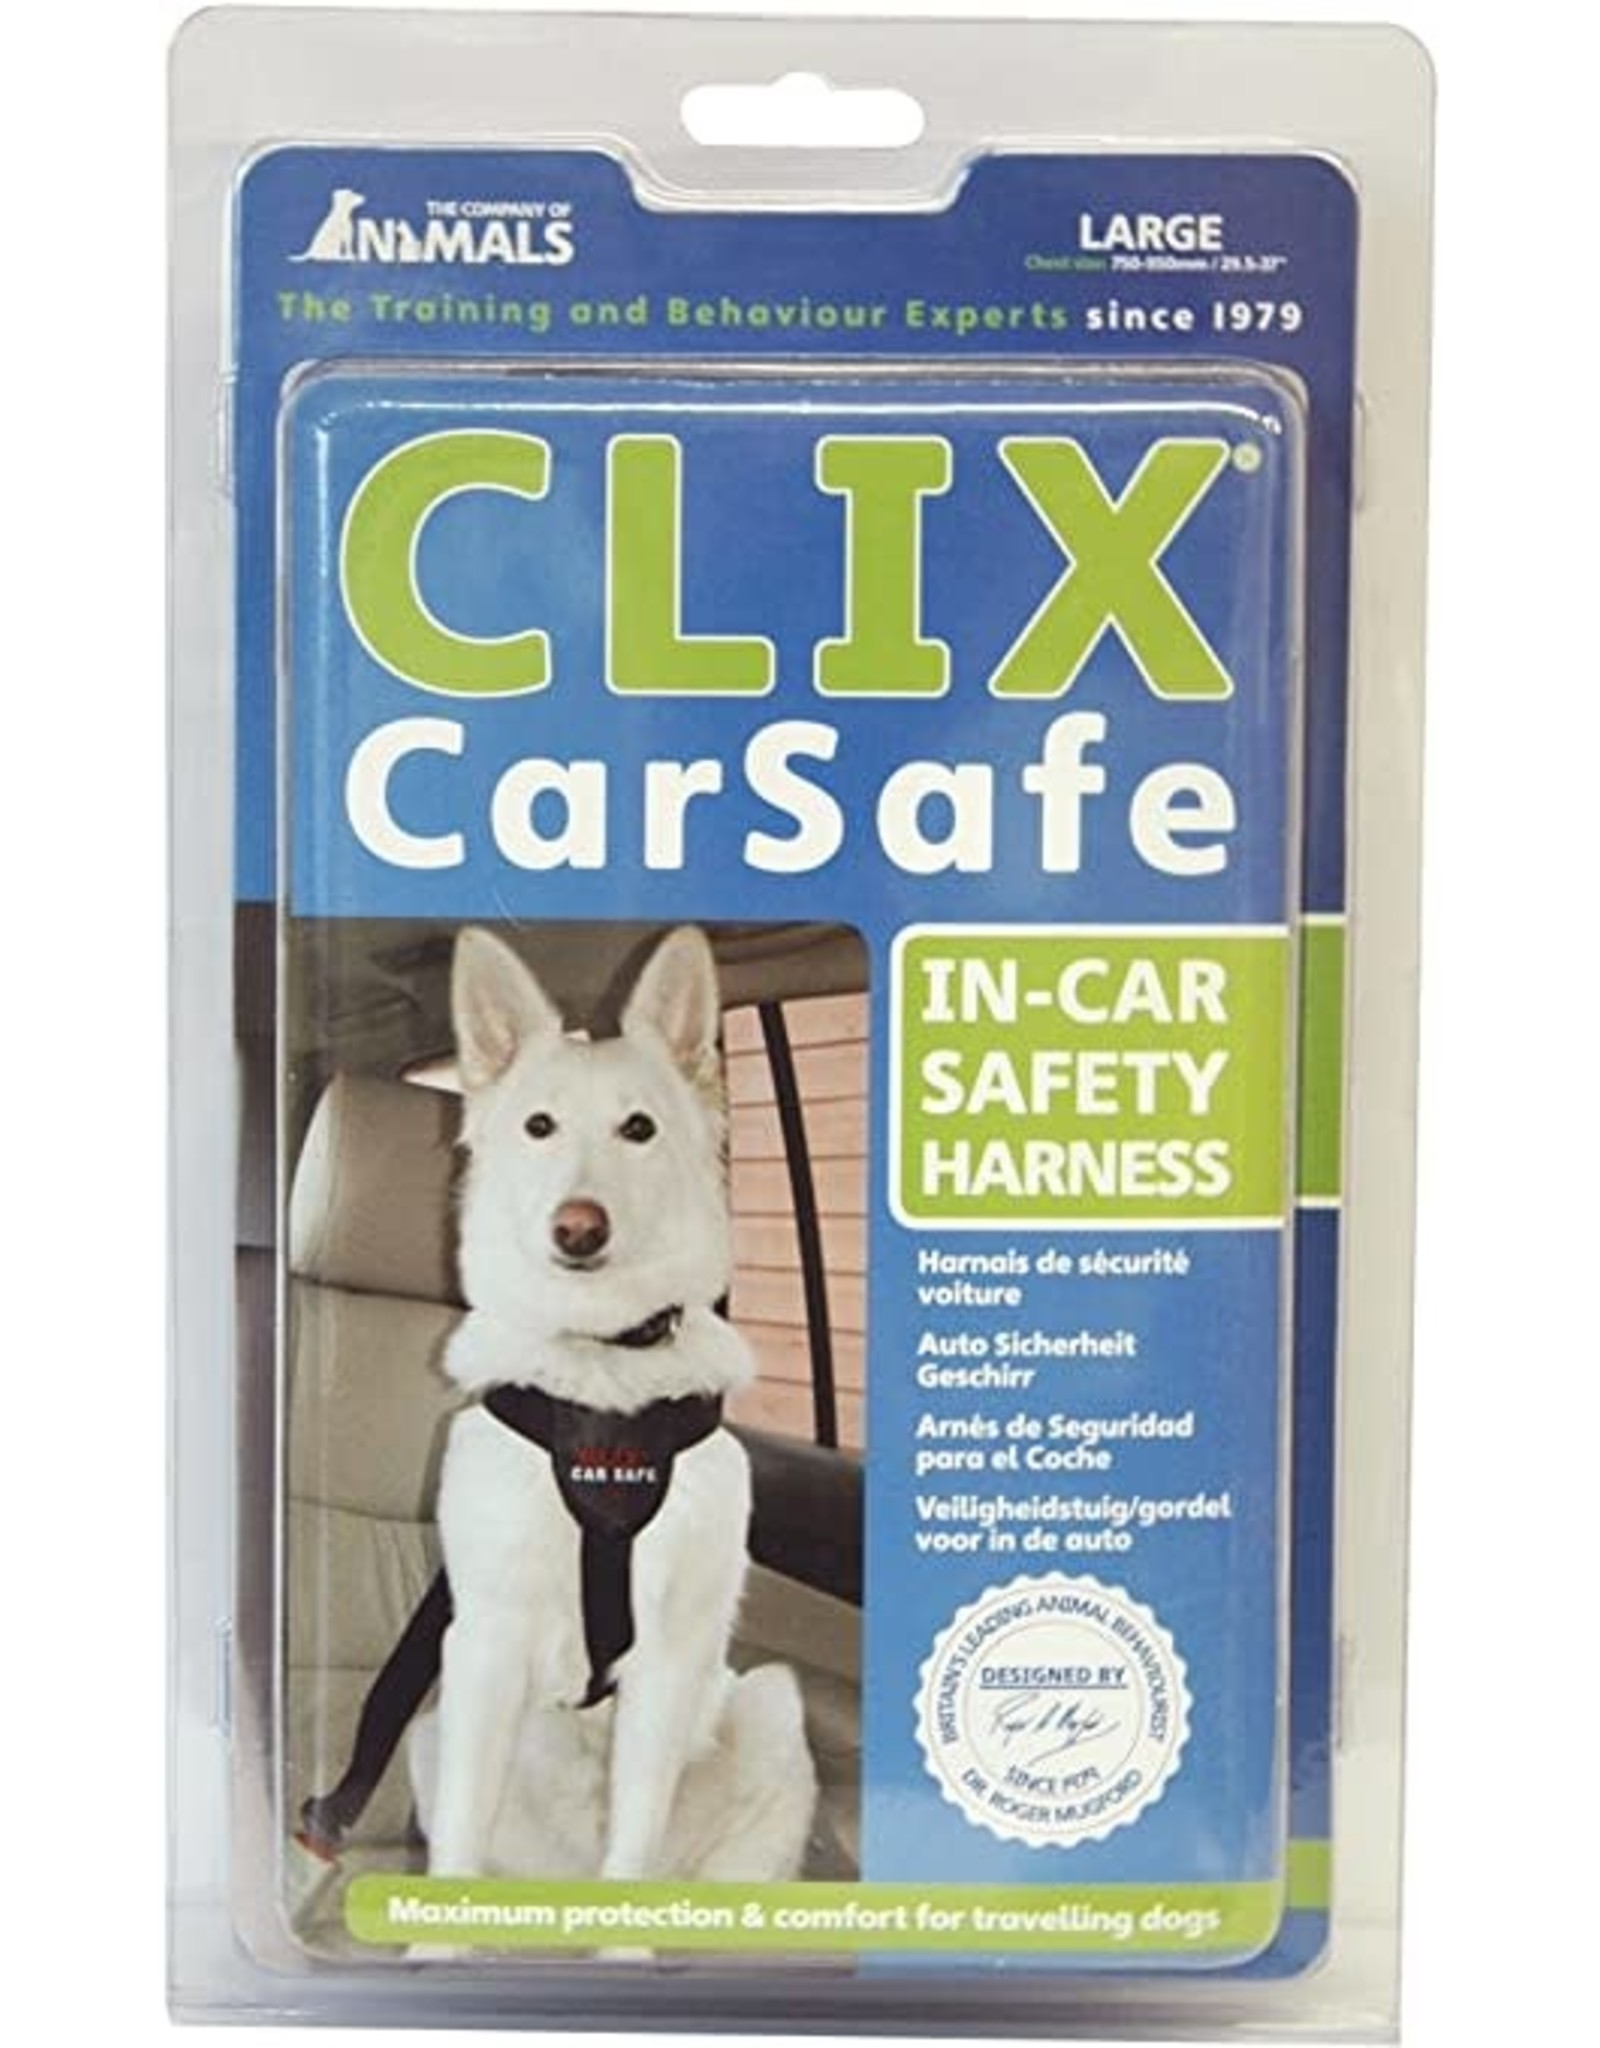 Clix Car Safe Harness Large